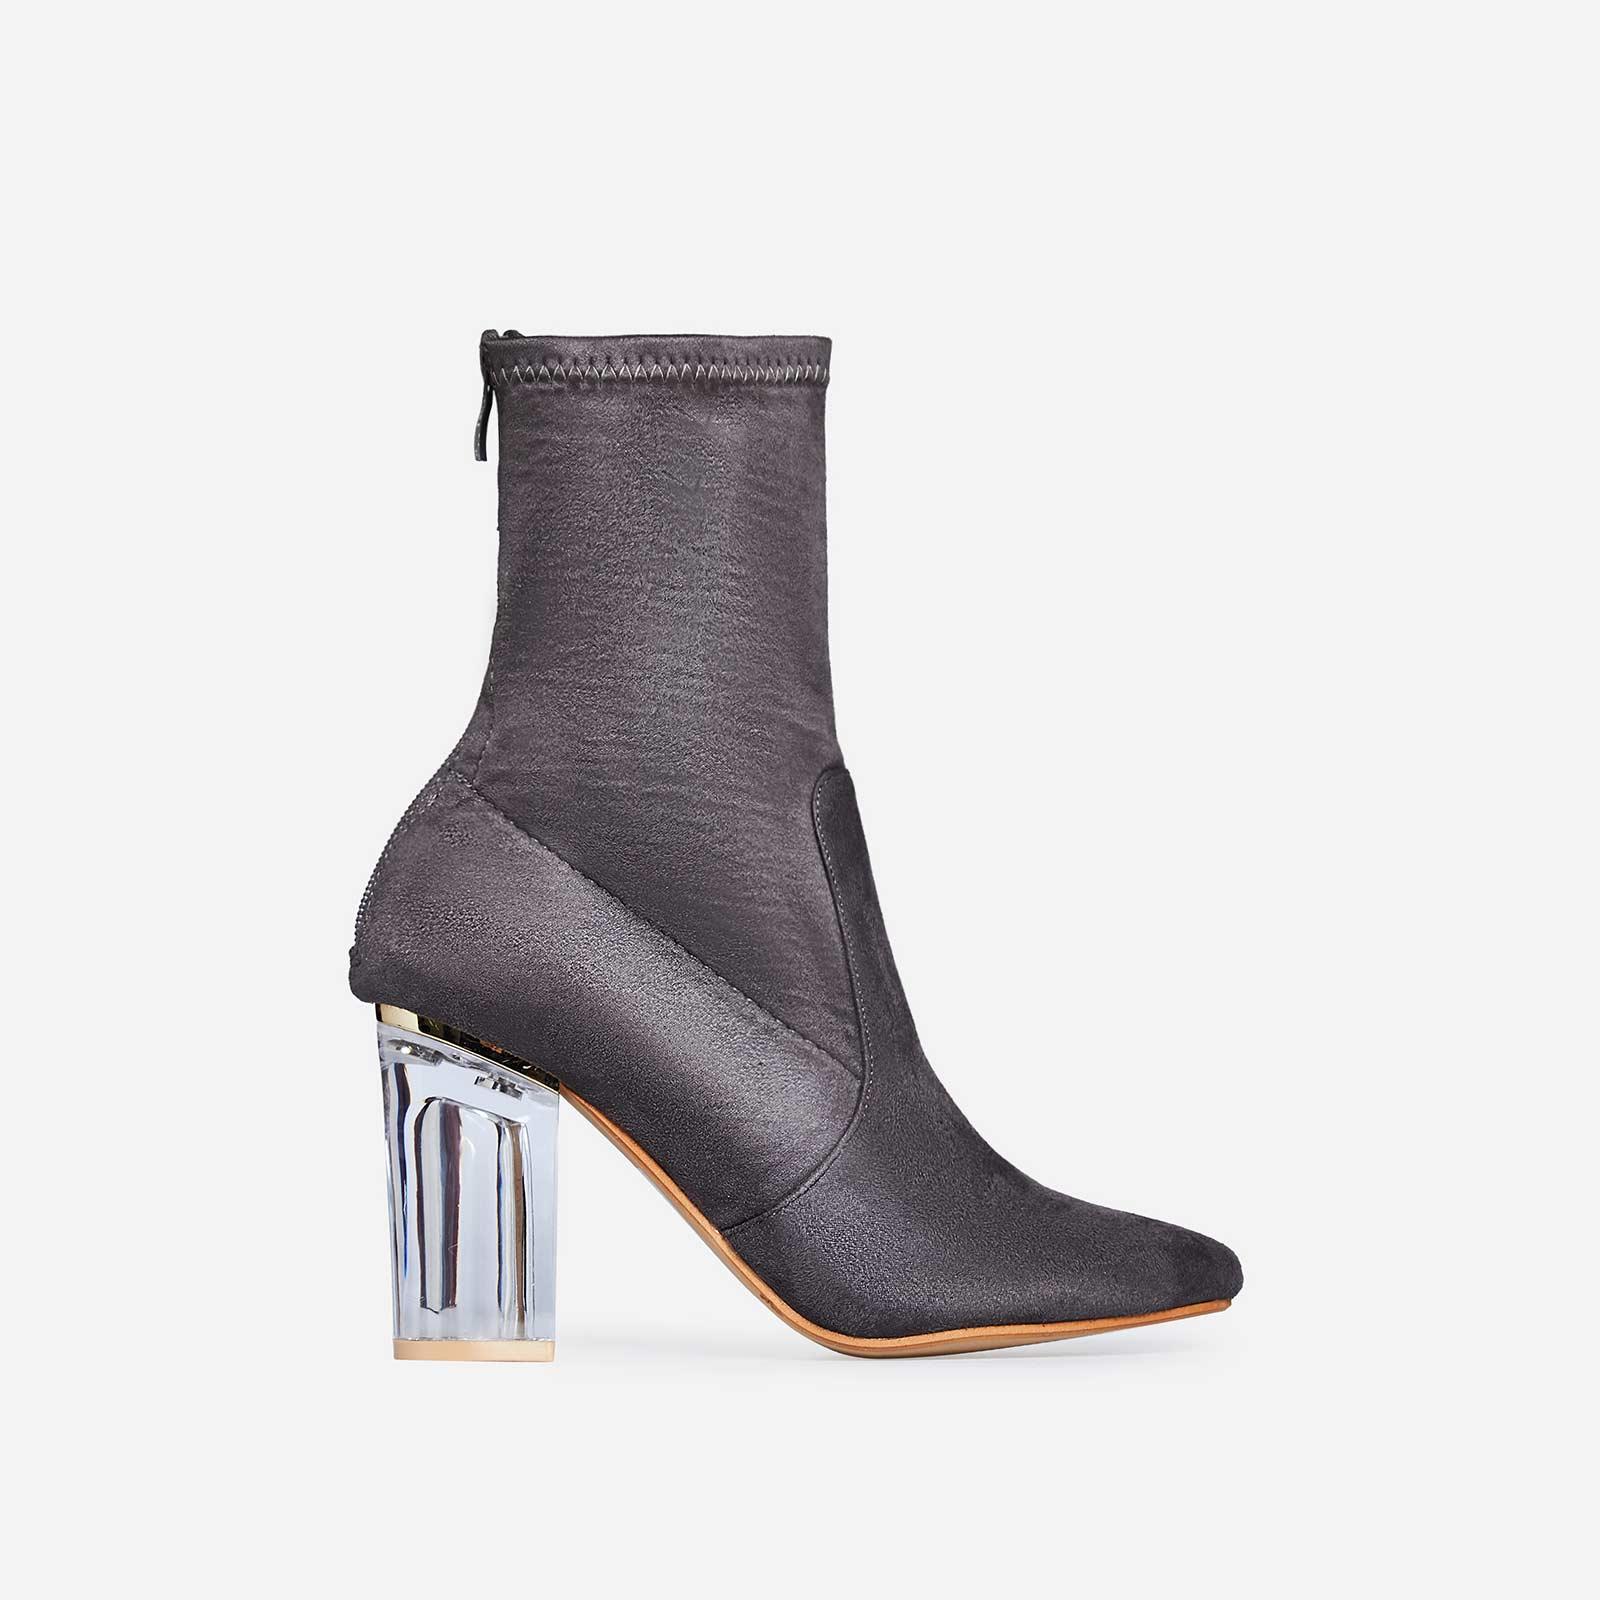 Maisie Perspex Block Heel Ankle Boot In Grey Faux Suede